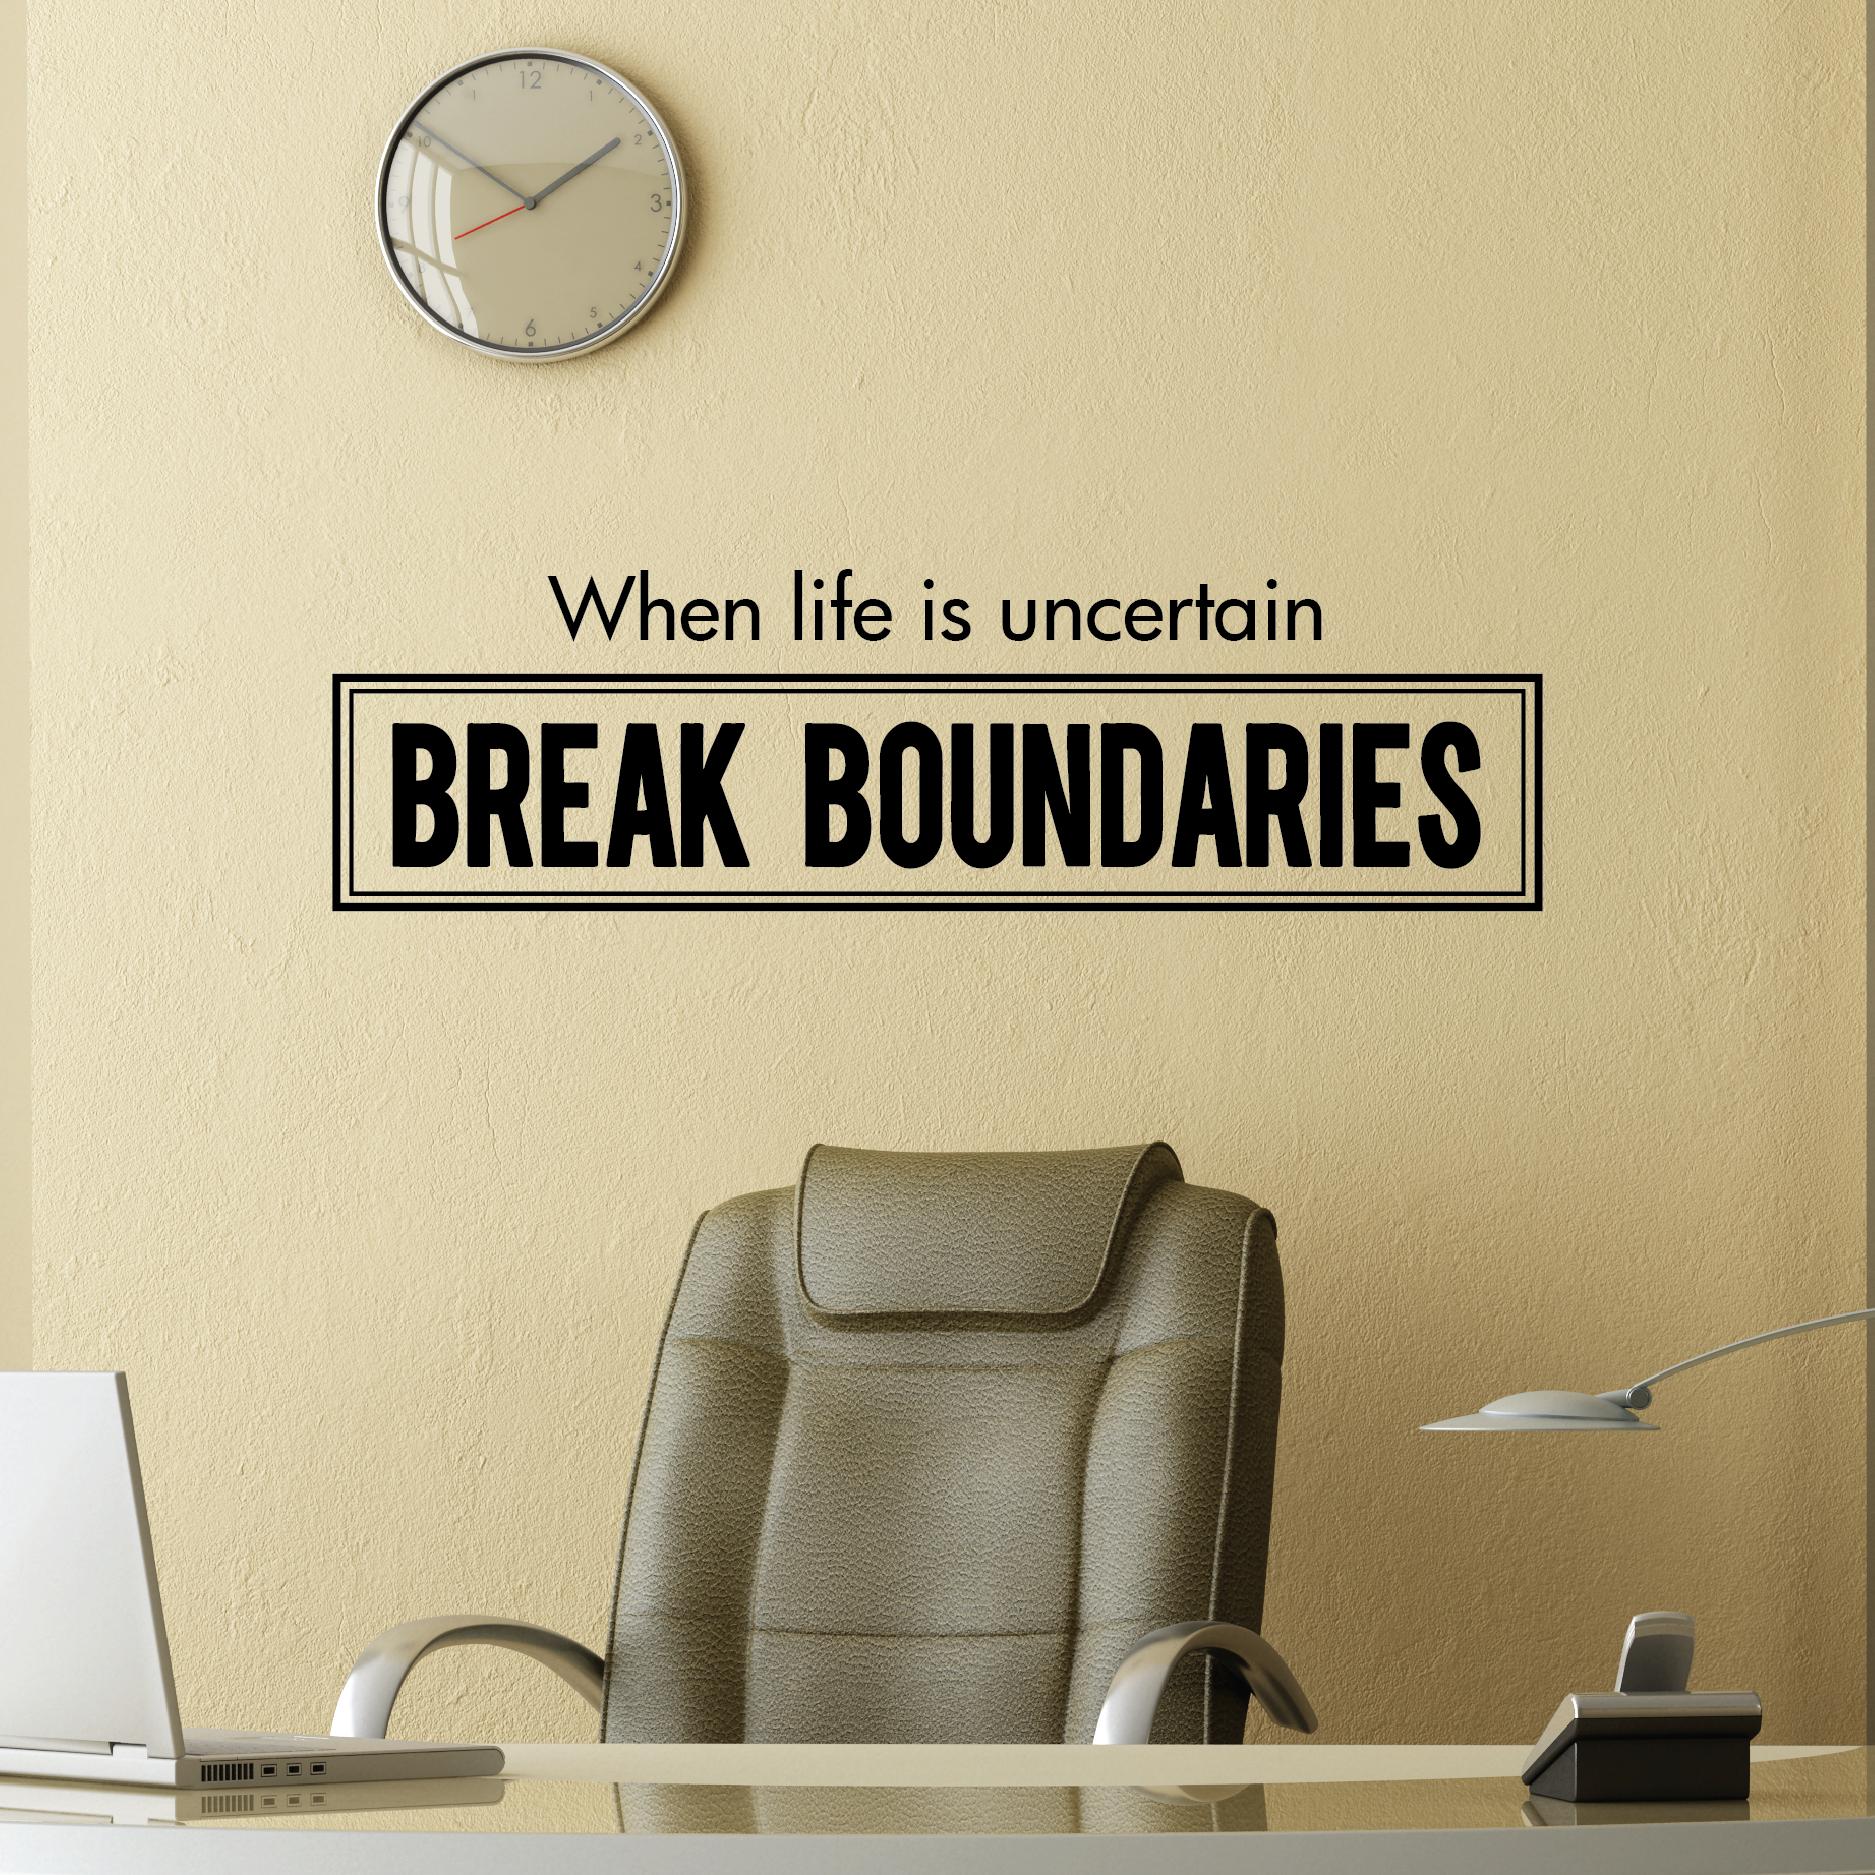 Break Boundaries Wall Quotes™ Decal | WallQuotes.com